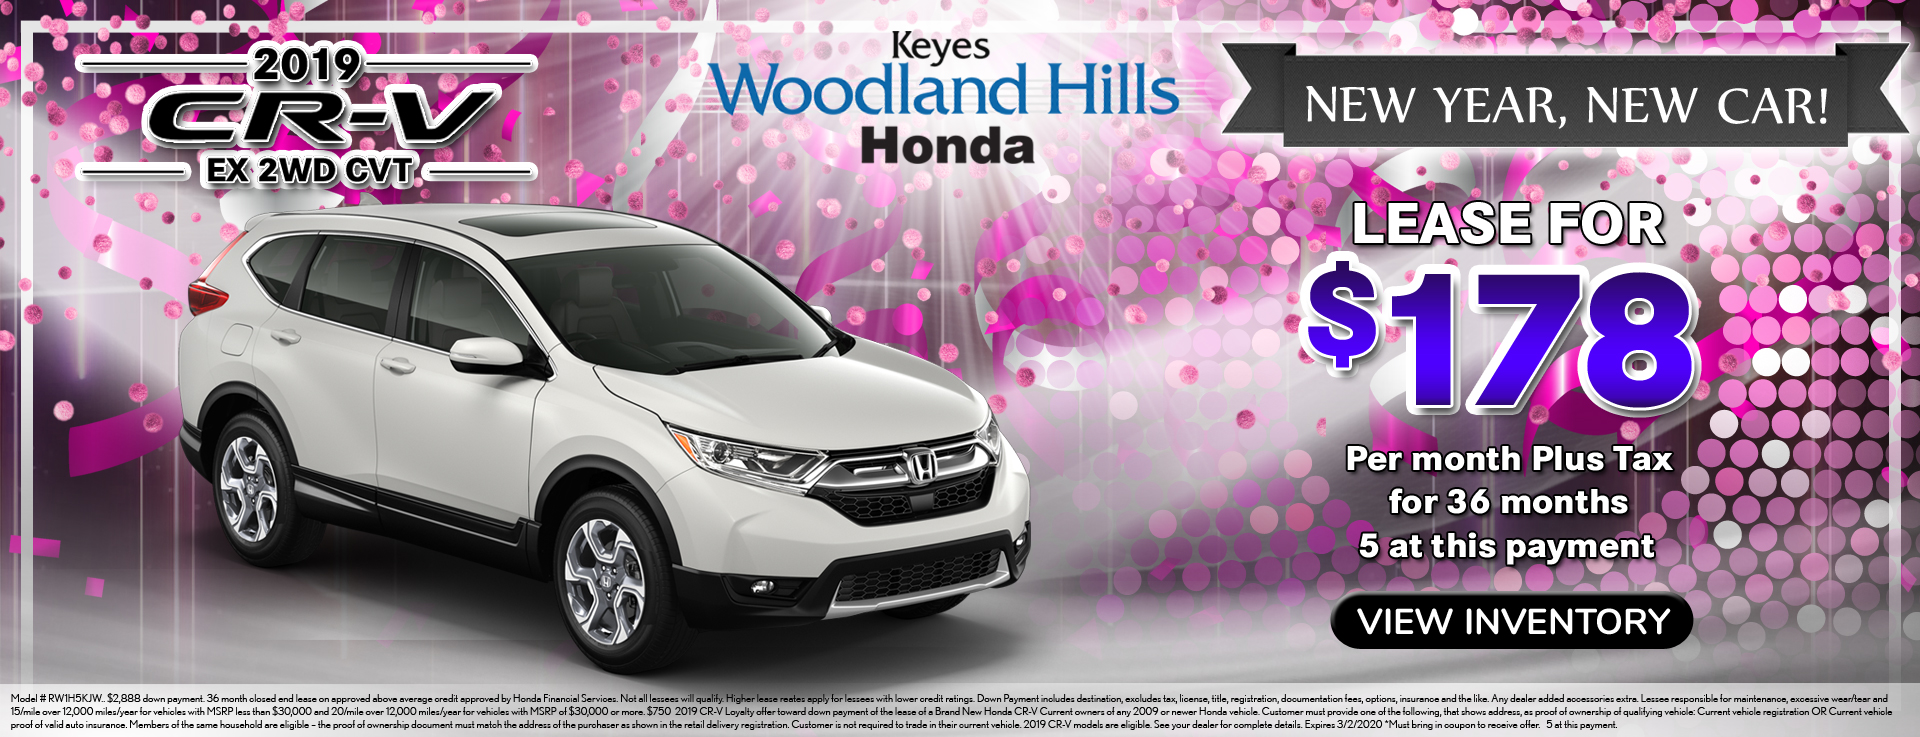 Keyes Woodland Hills >> New Used Honda Dealer Serving Los Angeles Keyes Woodland